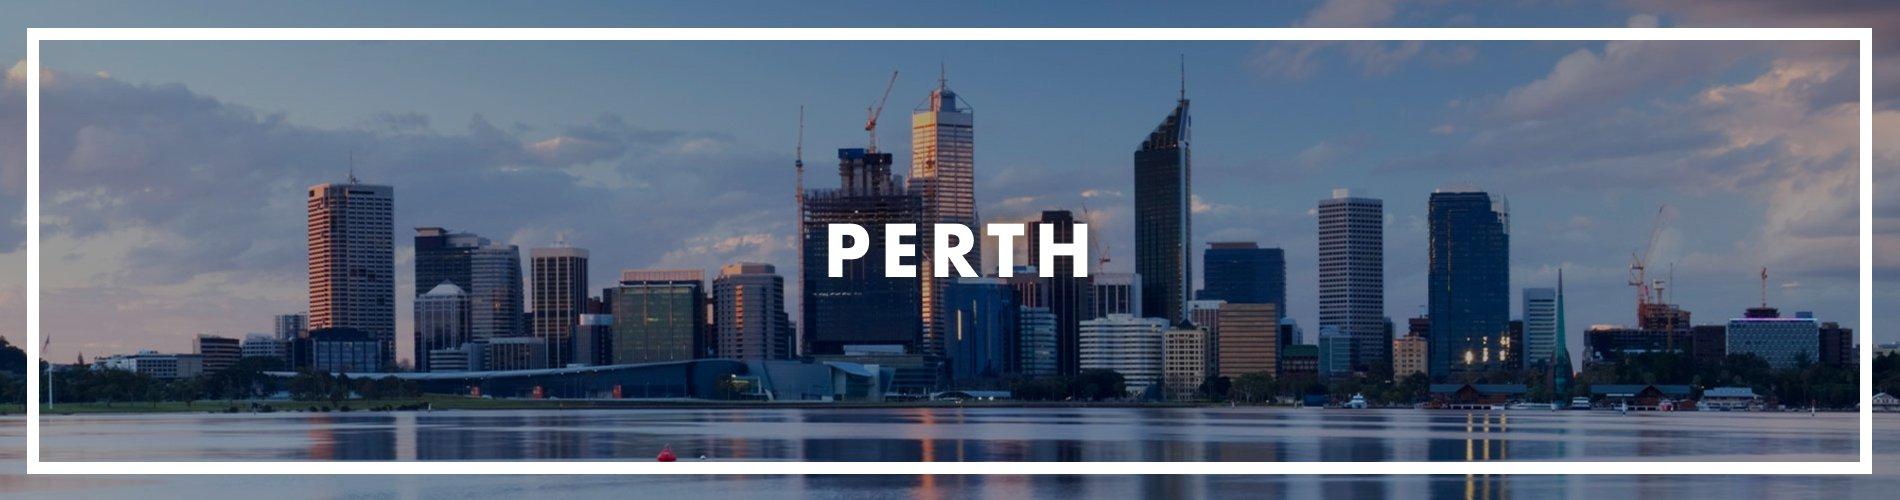 Perth banner